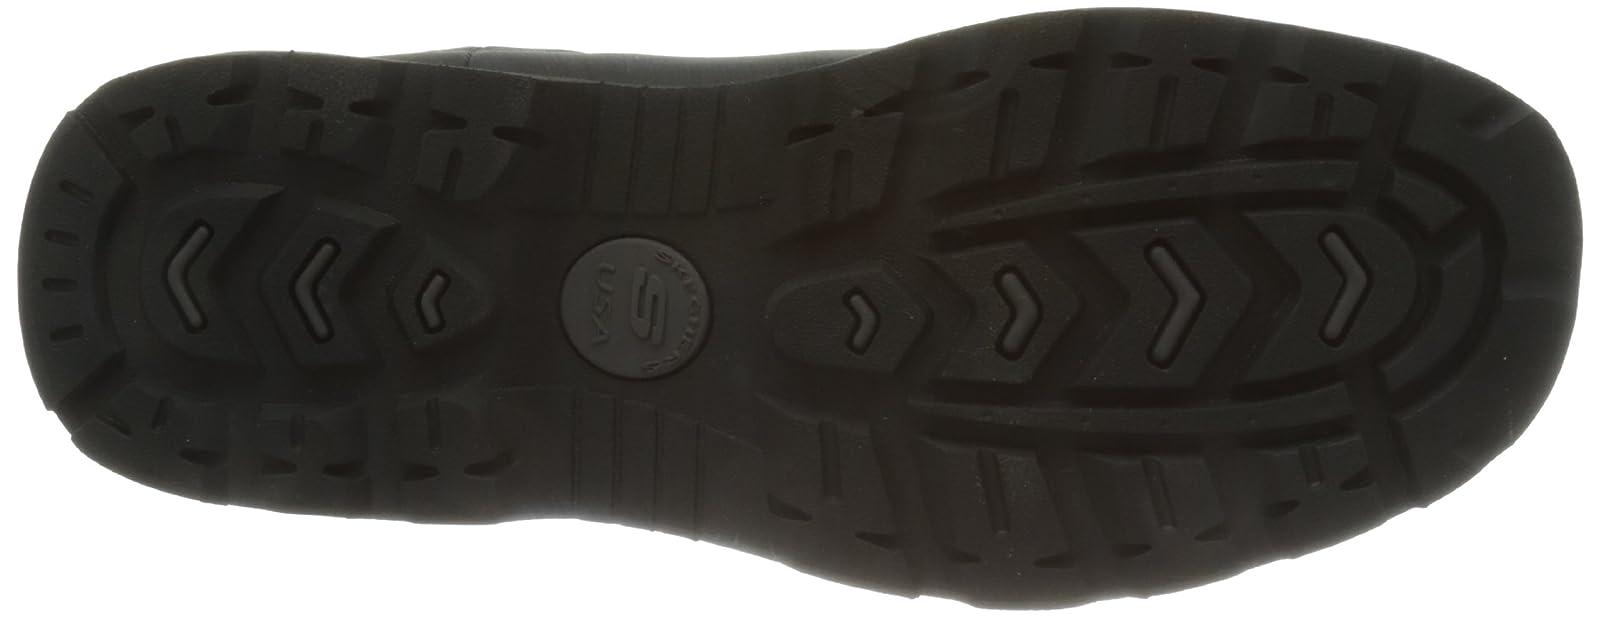 Skechers USA Men's Blaine Orsen Ankle Boot Dark Brown - 3